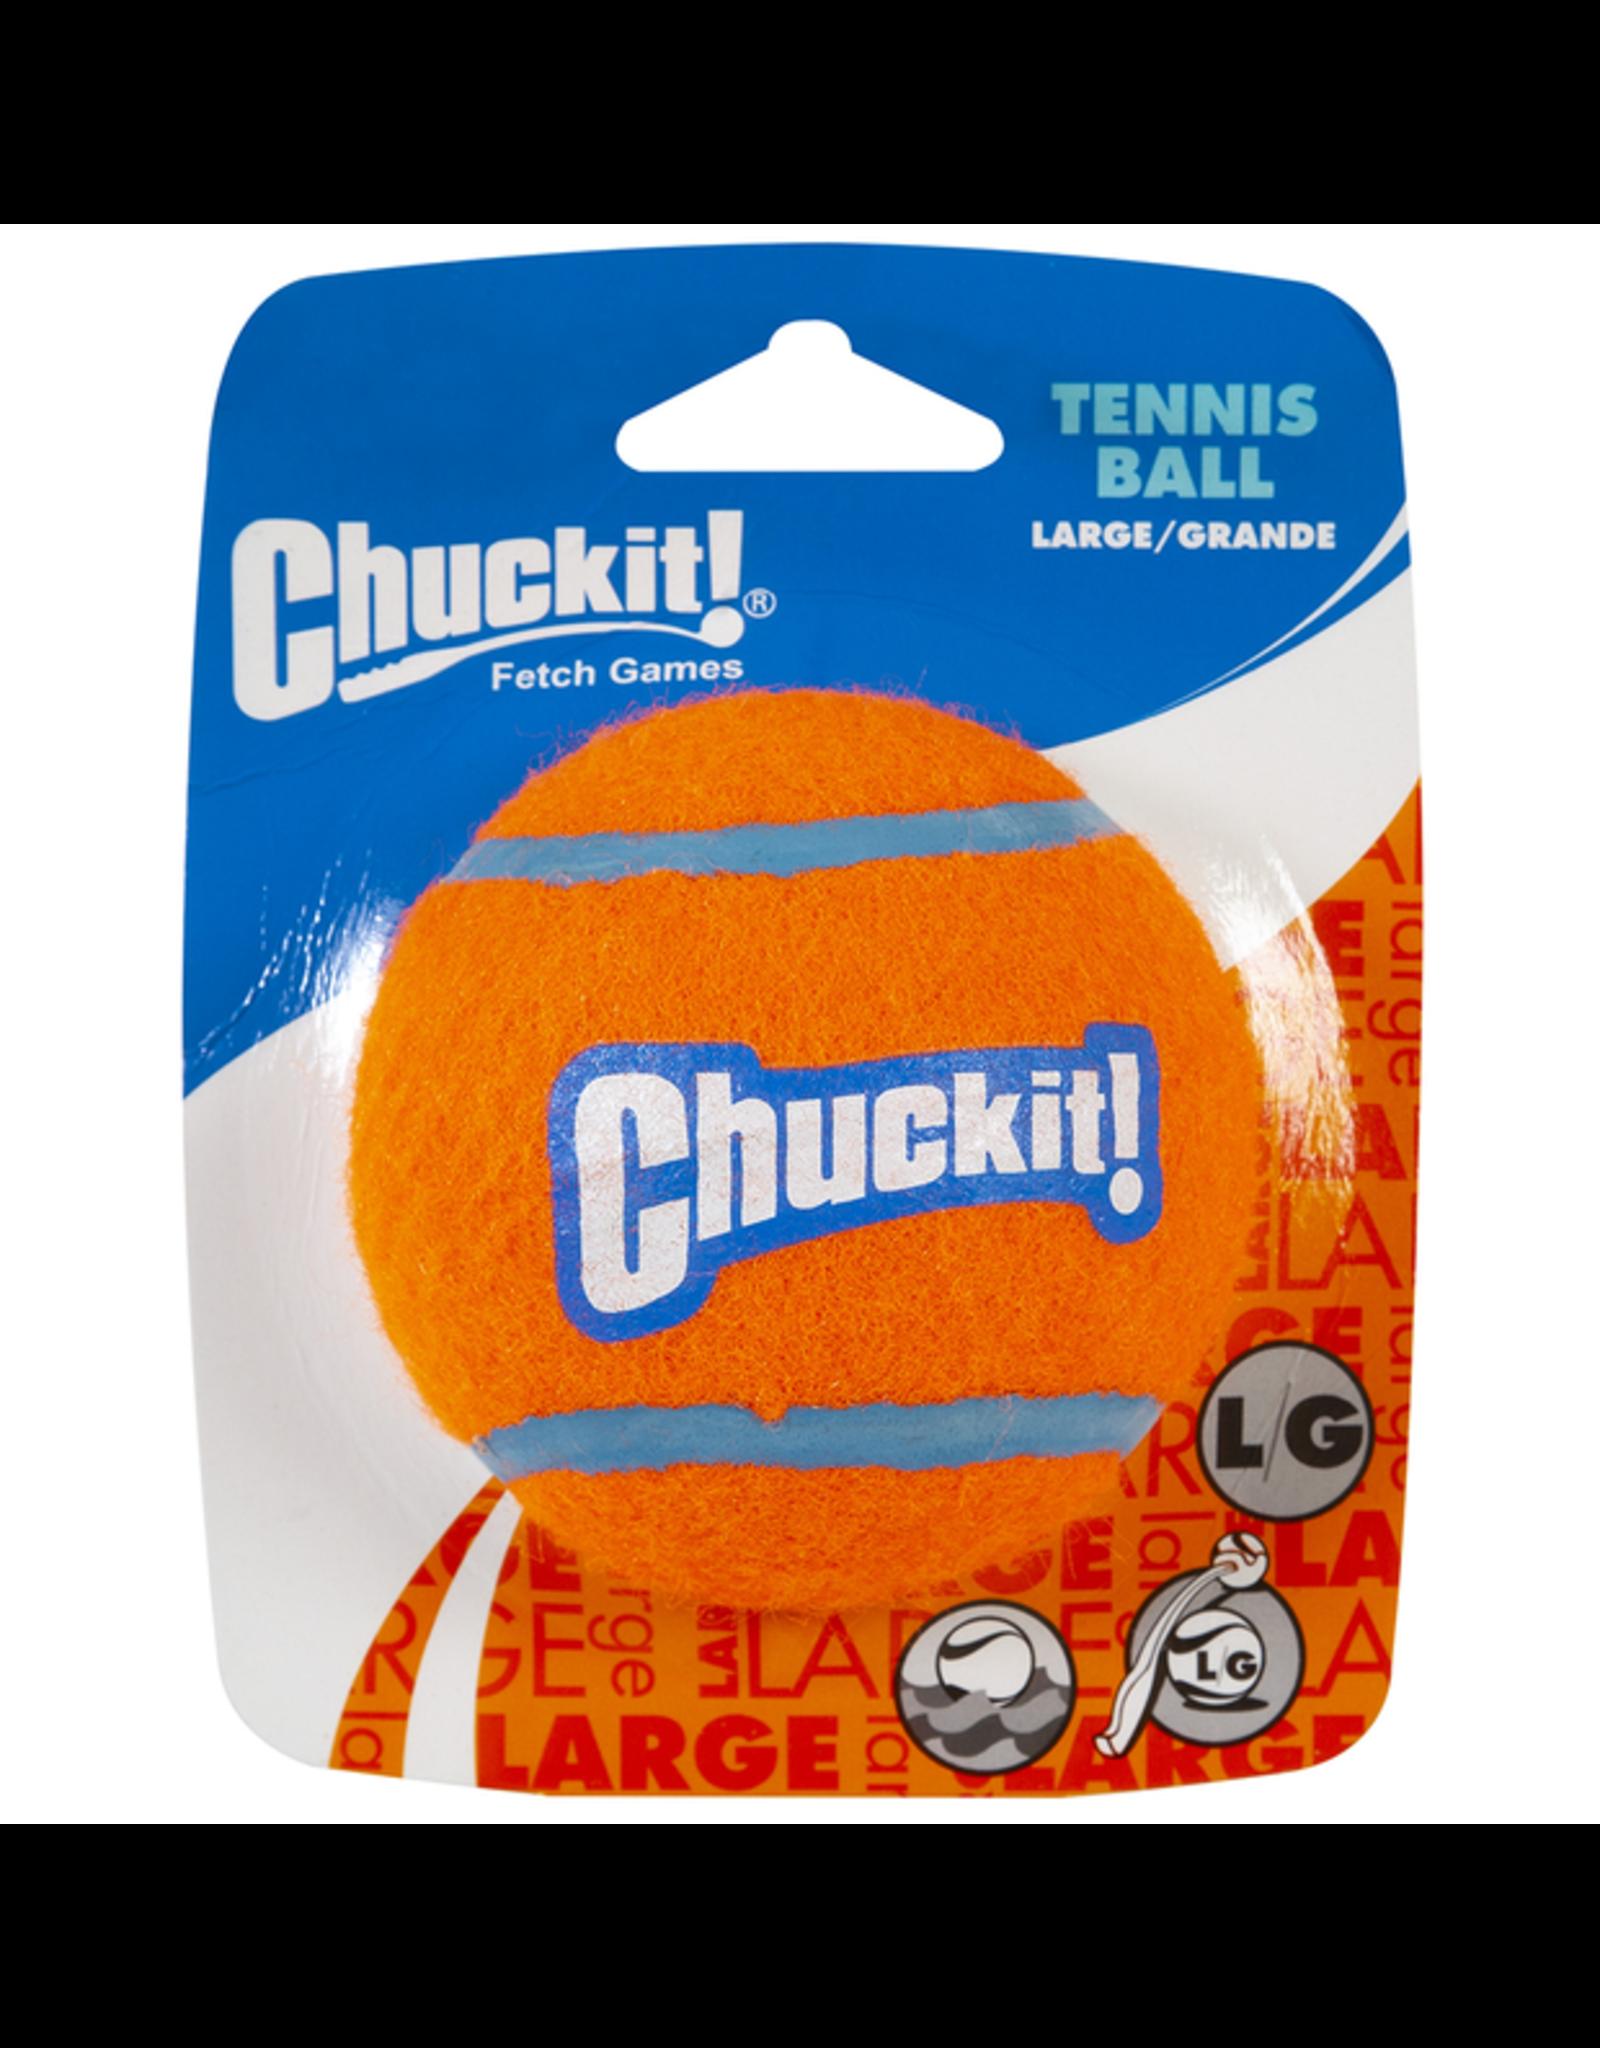 Chuckit! Tennis Balls 1-Pack Large